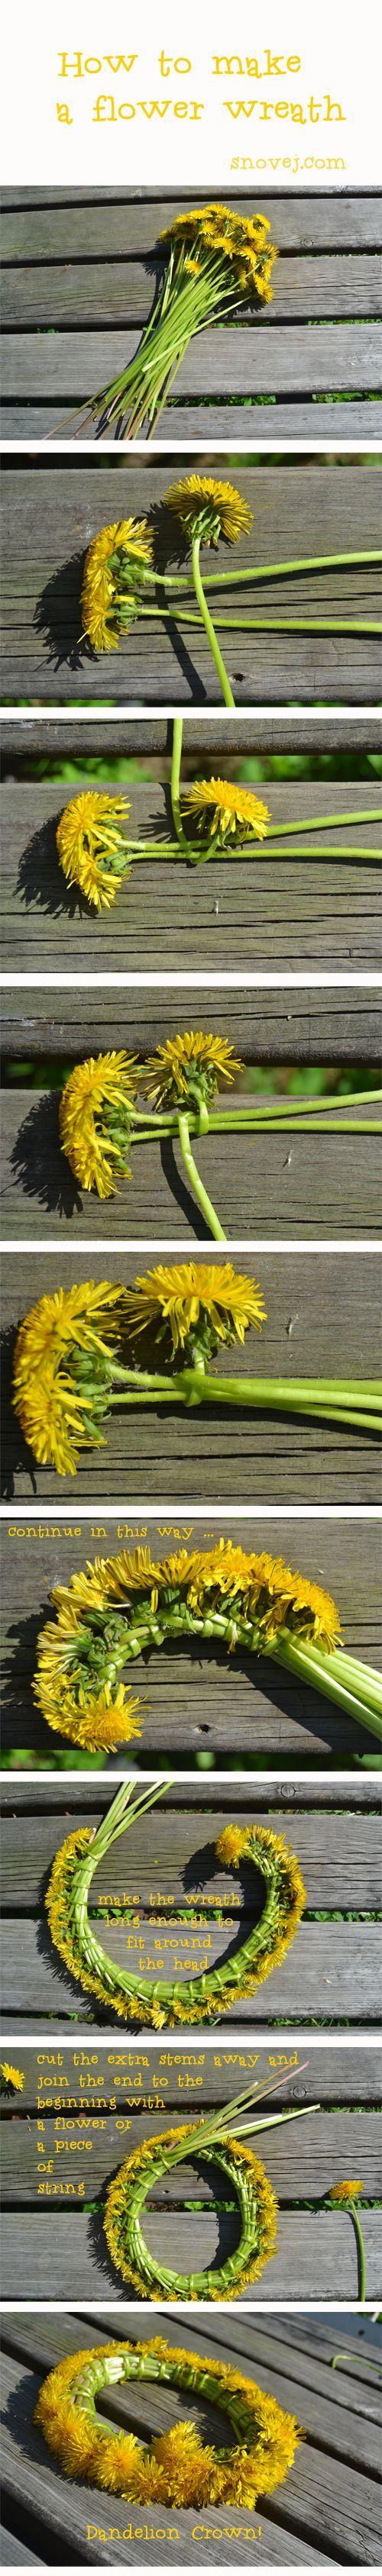 Photo of Dandelion Wreath and Appetizer!,  #Appetizer #creativegardenideassummer #Dandelion #Wreath